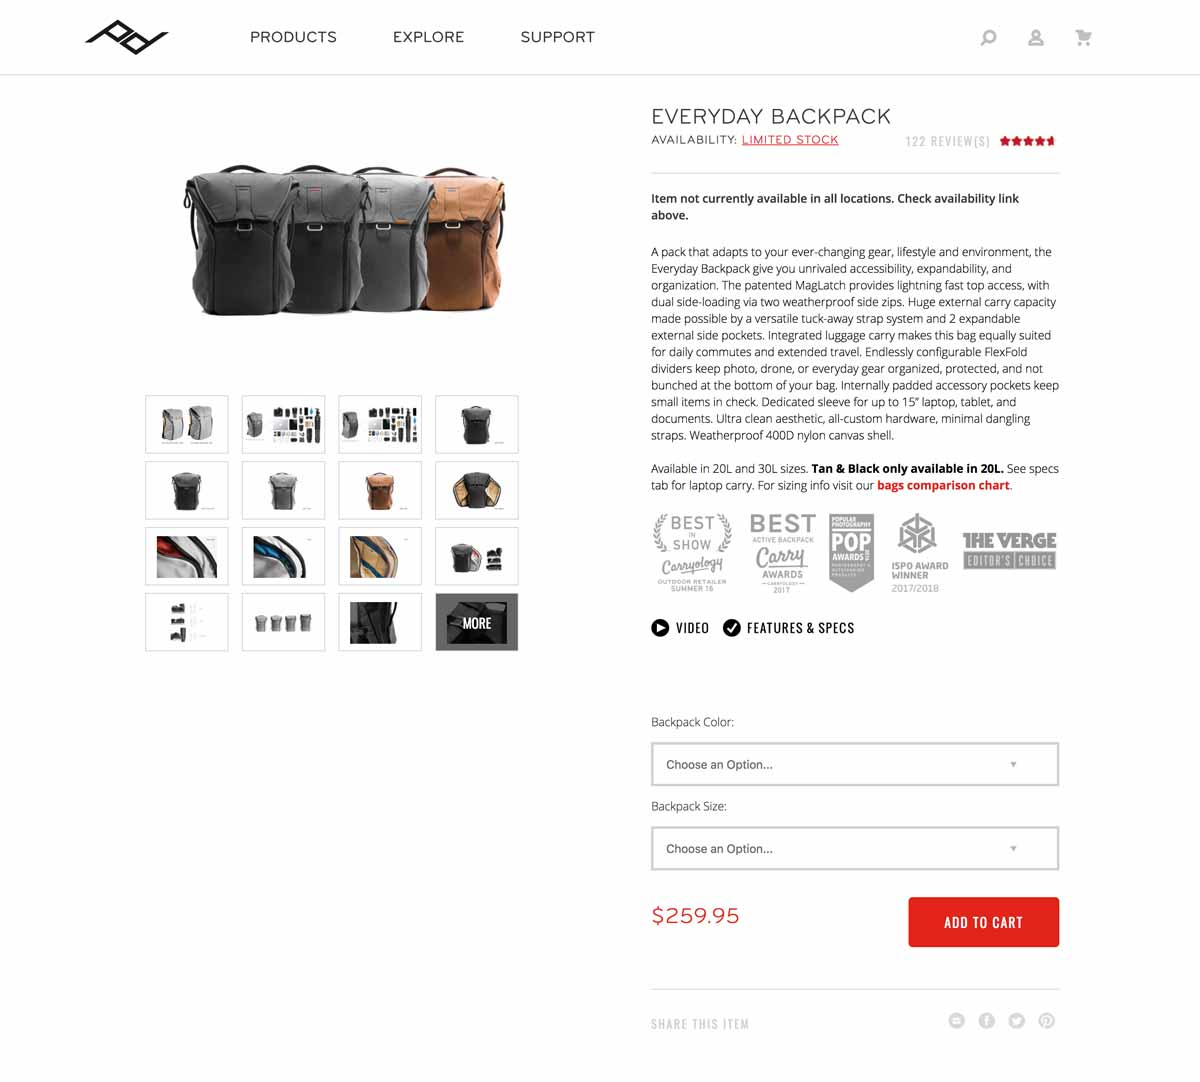 Peak Design Online Product Page